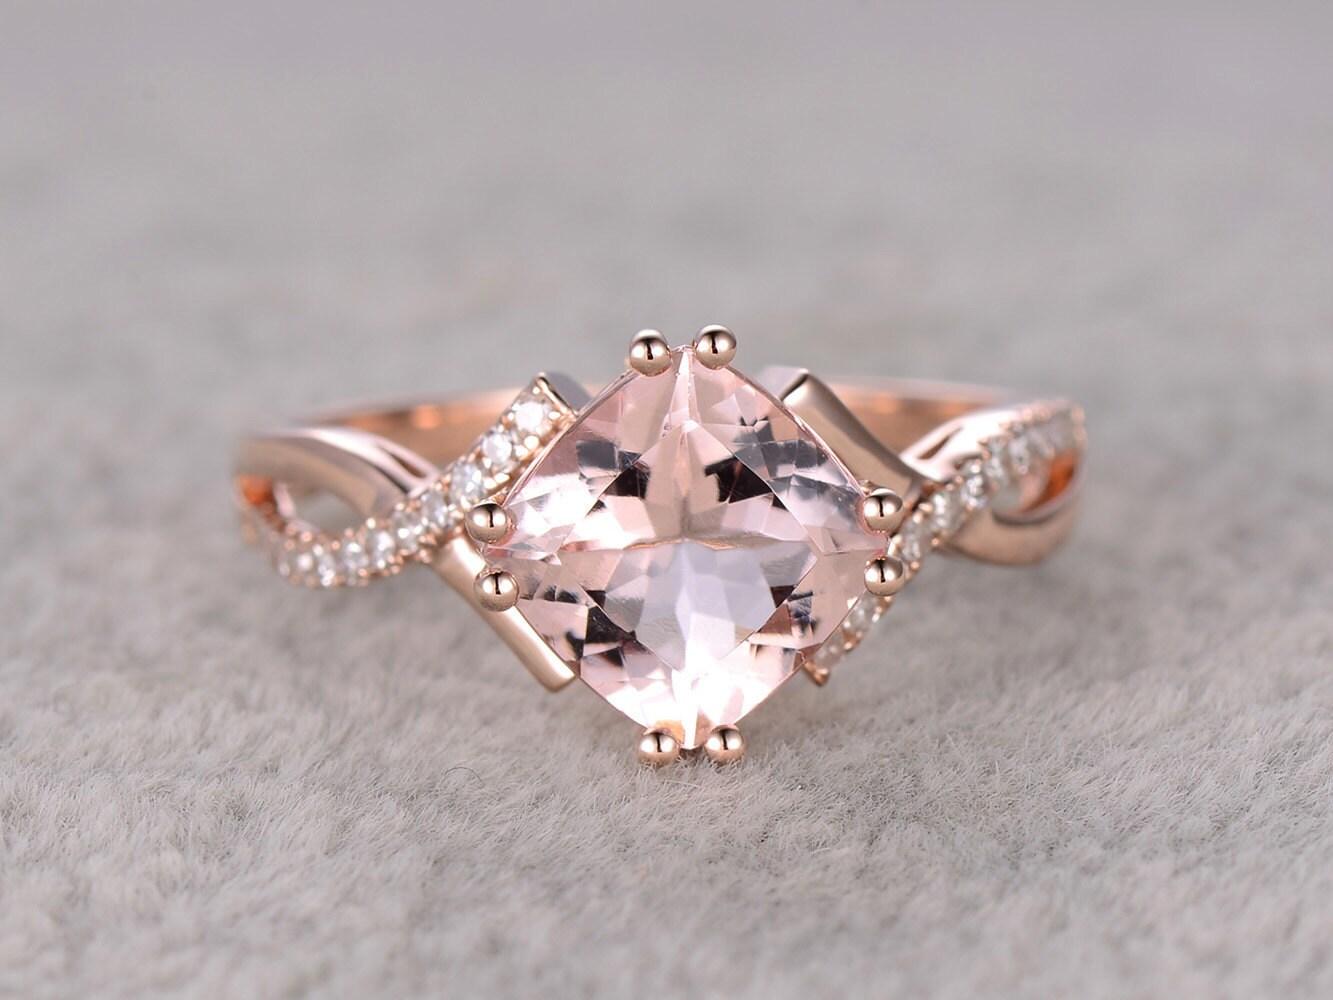 7mm cushion morganite engagement ring rose golddiamond. Black Bedroom Furniture Sets. Home Design Ideas